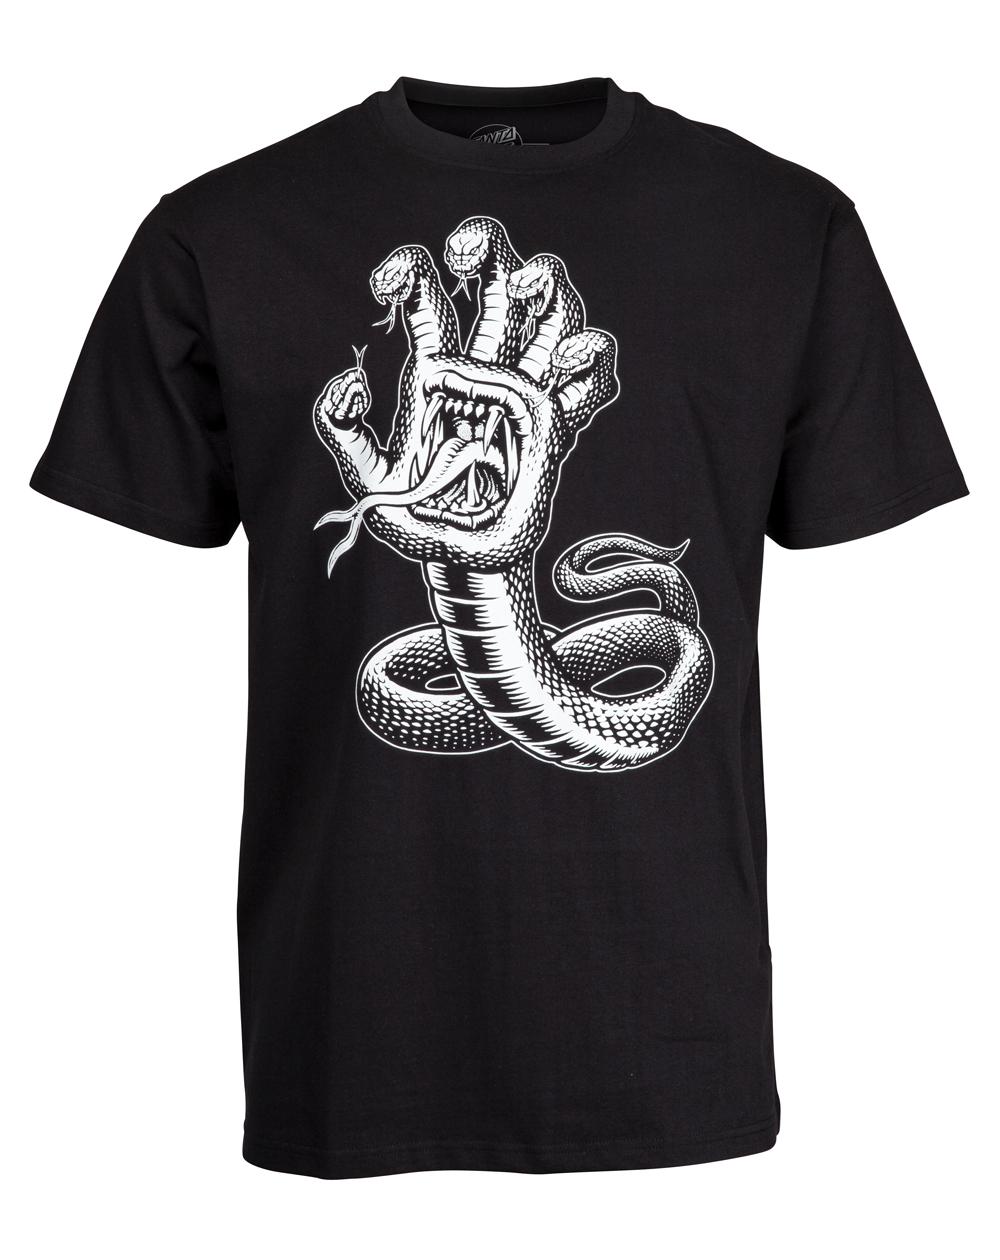 Santa Cruz Men's T-Shirt Hissing Hand Black